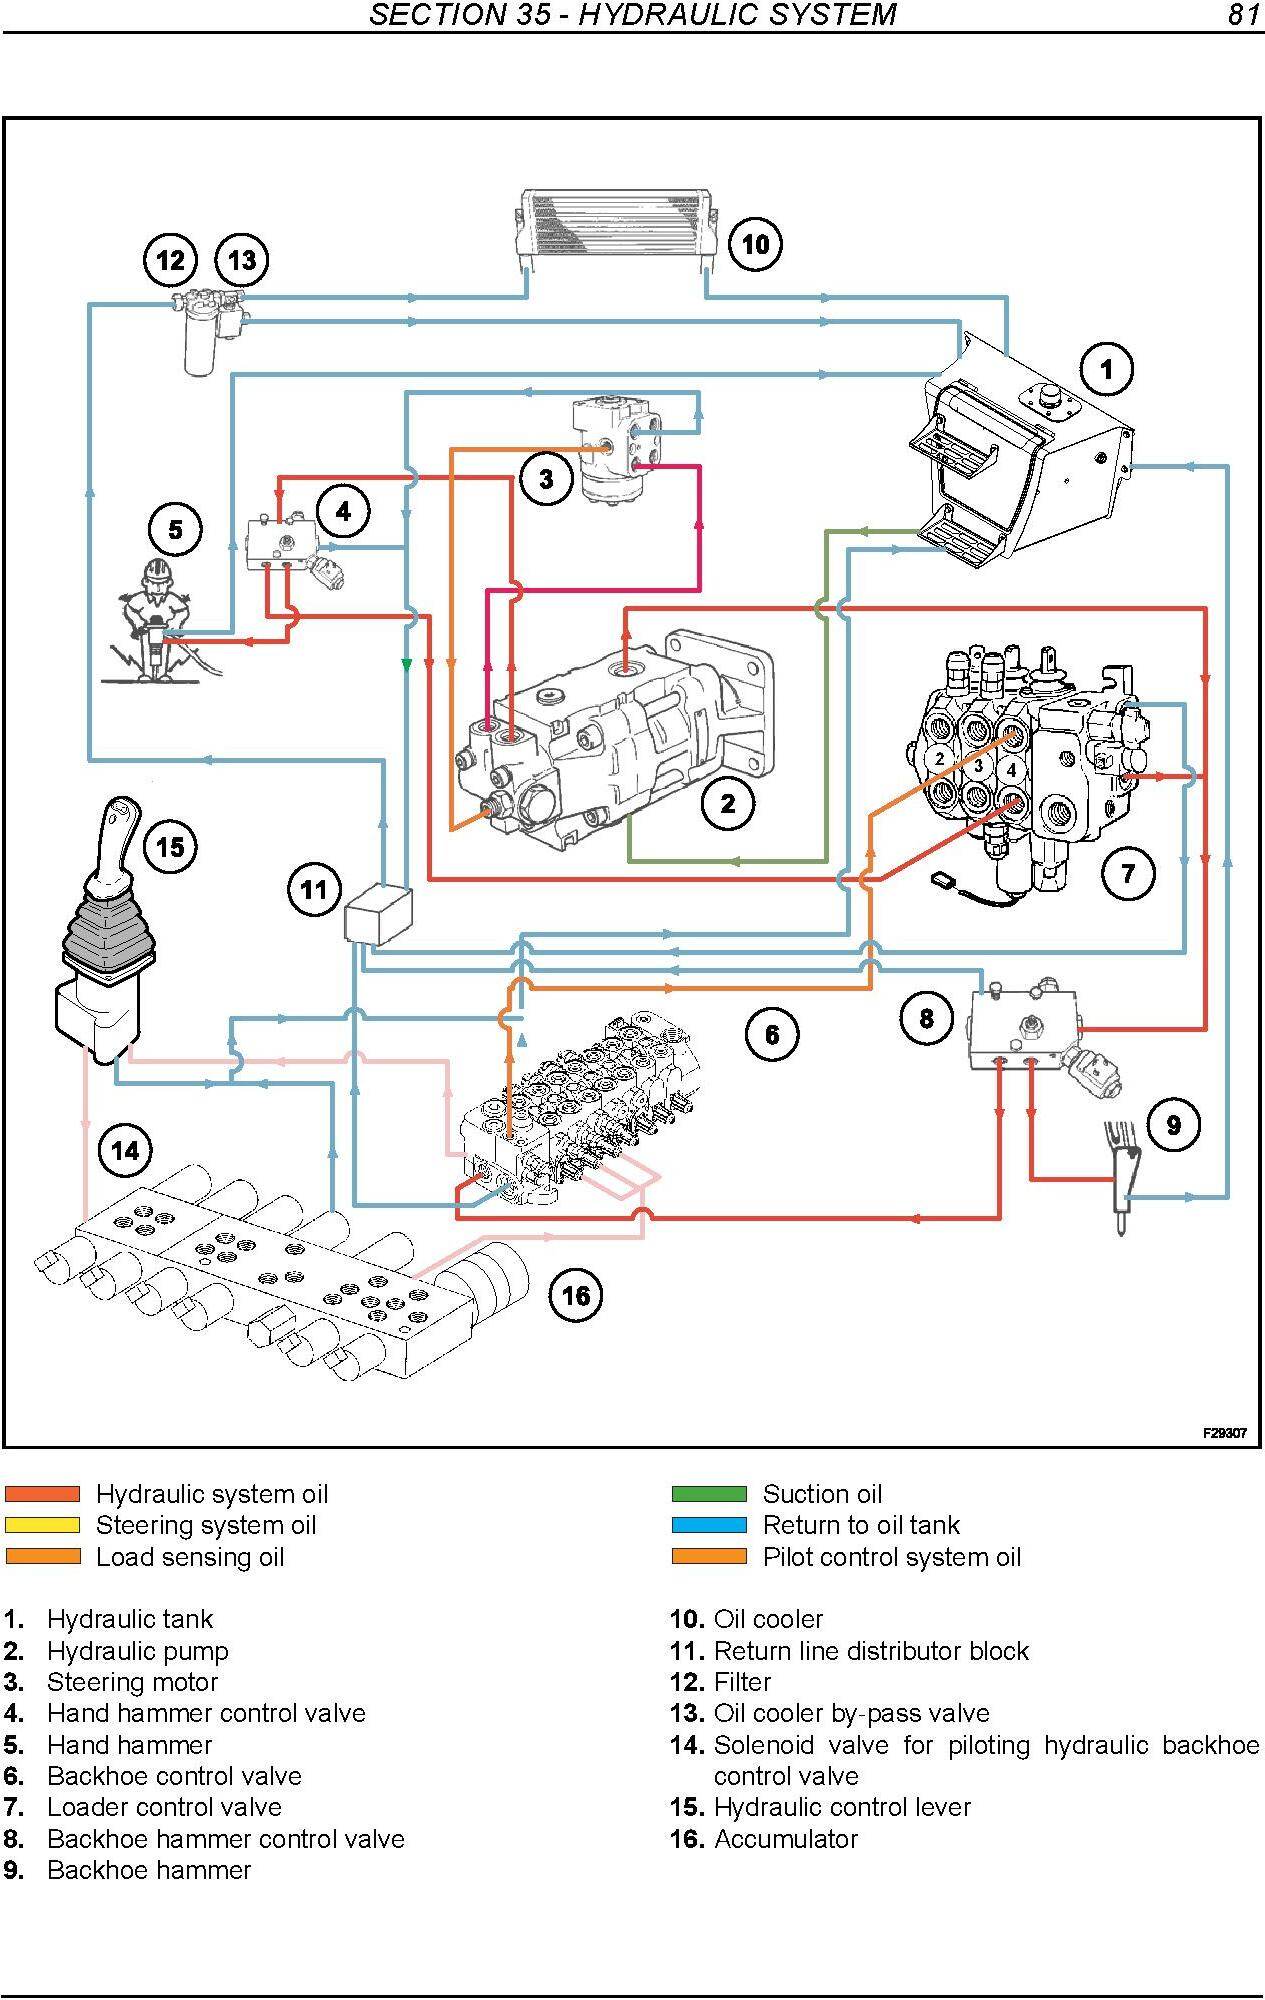 New Holland B90B, B95B, B95BLR, B95BTC, B110B, B115B Tier 3 Backhoe Loader Service Manual - 3